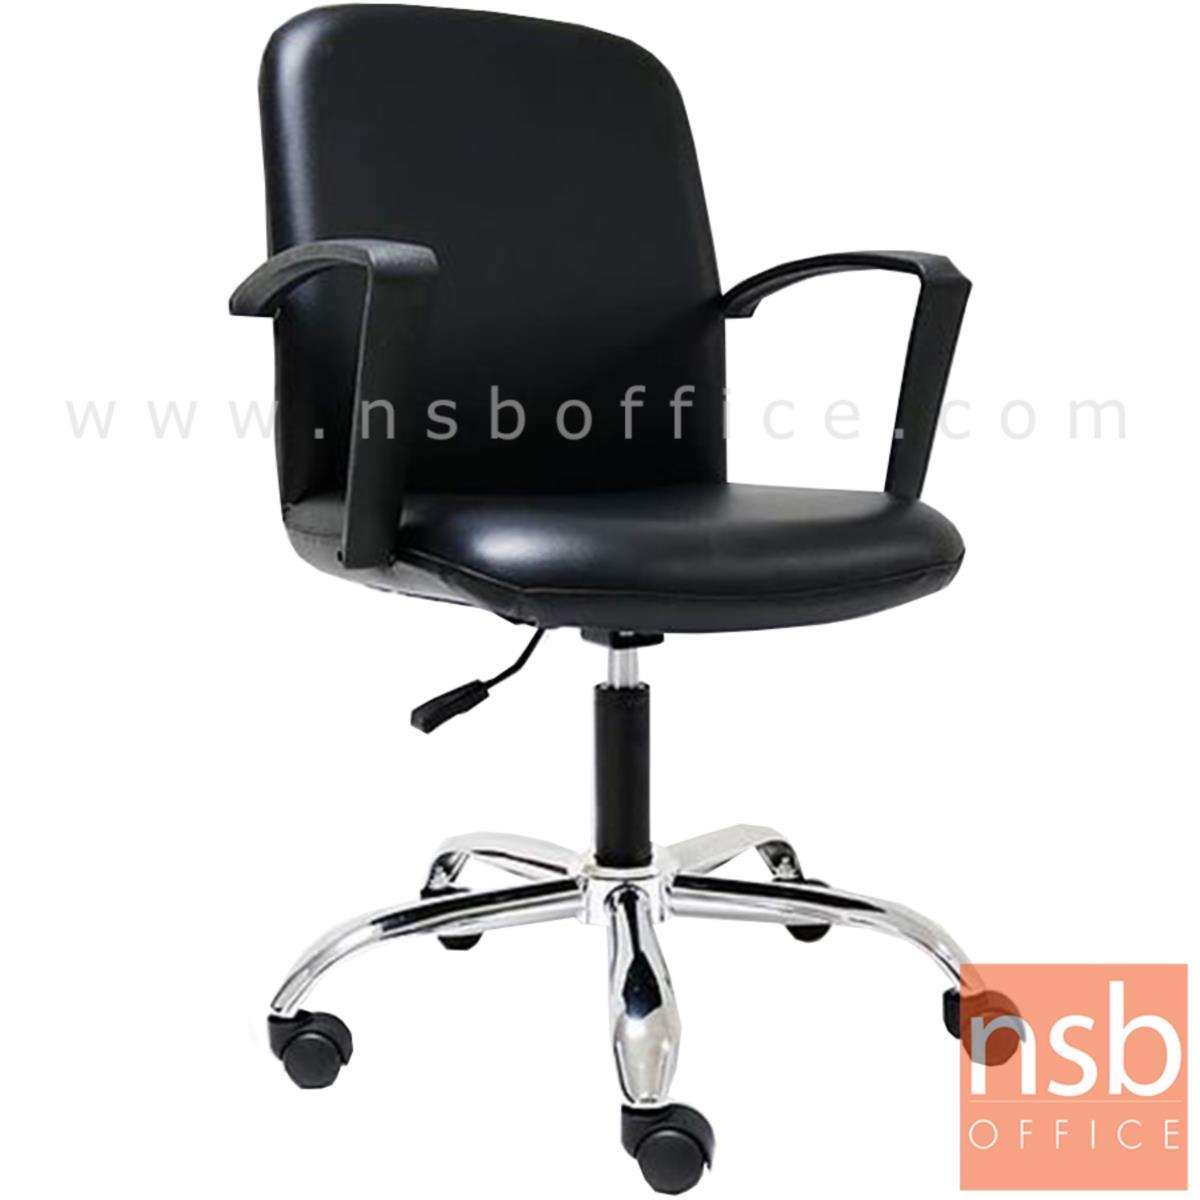 B03A453:เก้าอี้สำนักงาน  รุ่น PE-0061L  โช๊คแก๊ส ขาเหล็กชุบโครเมี่ยม